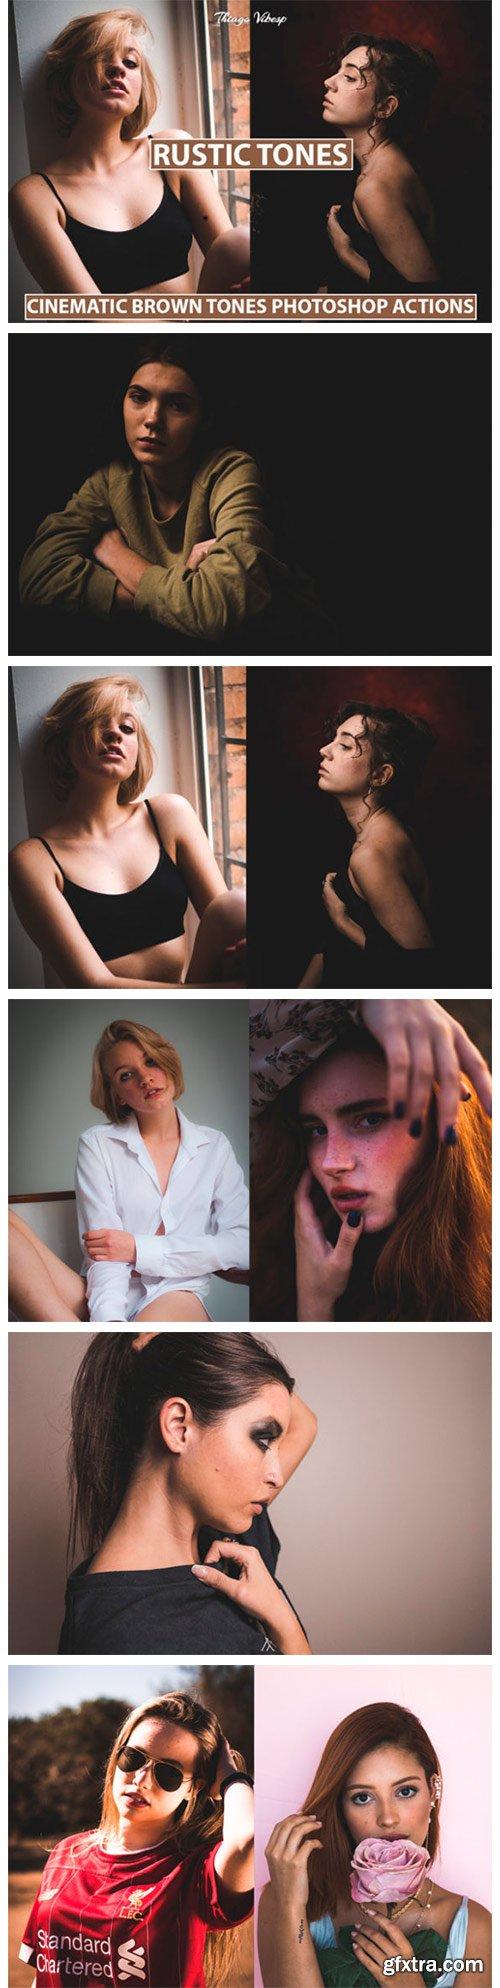 5 Photoshop Actions Rustic Tones 8566327